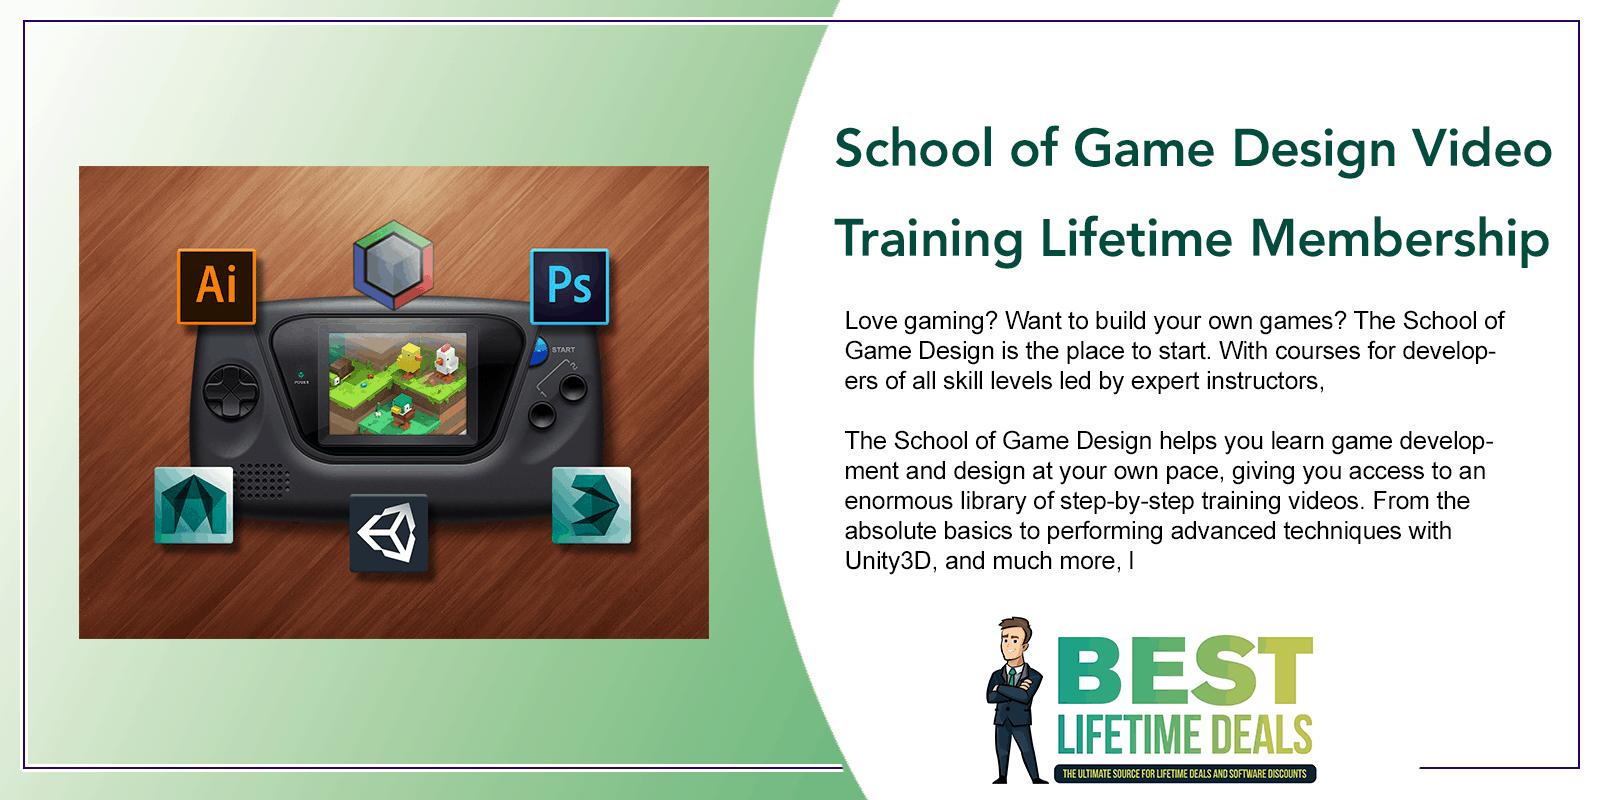 School of Game Design Video